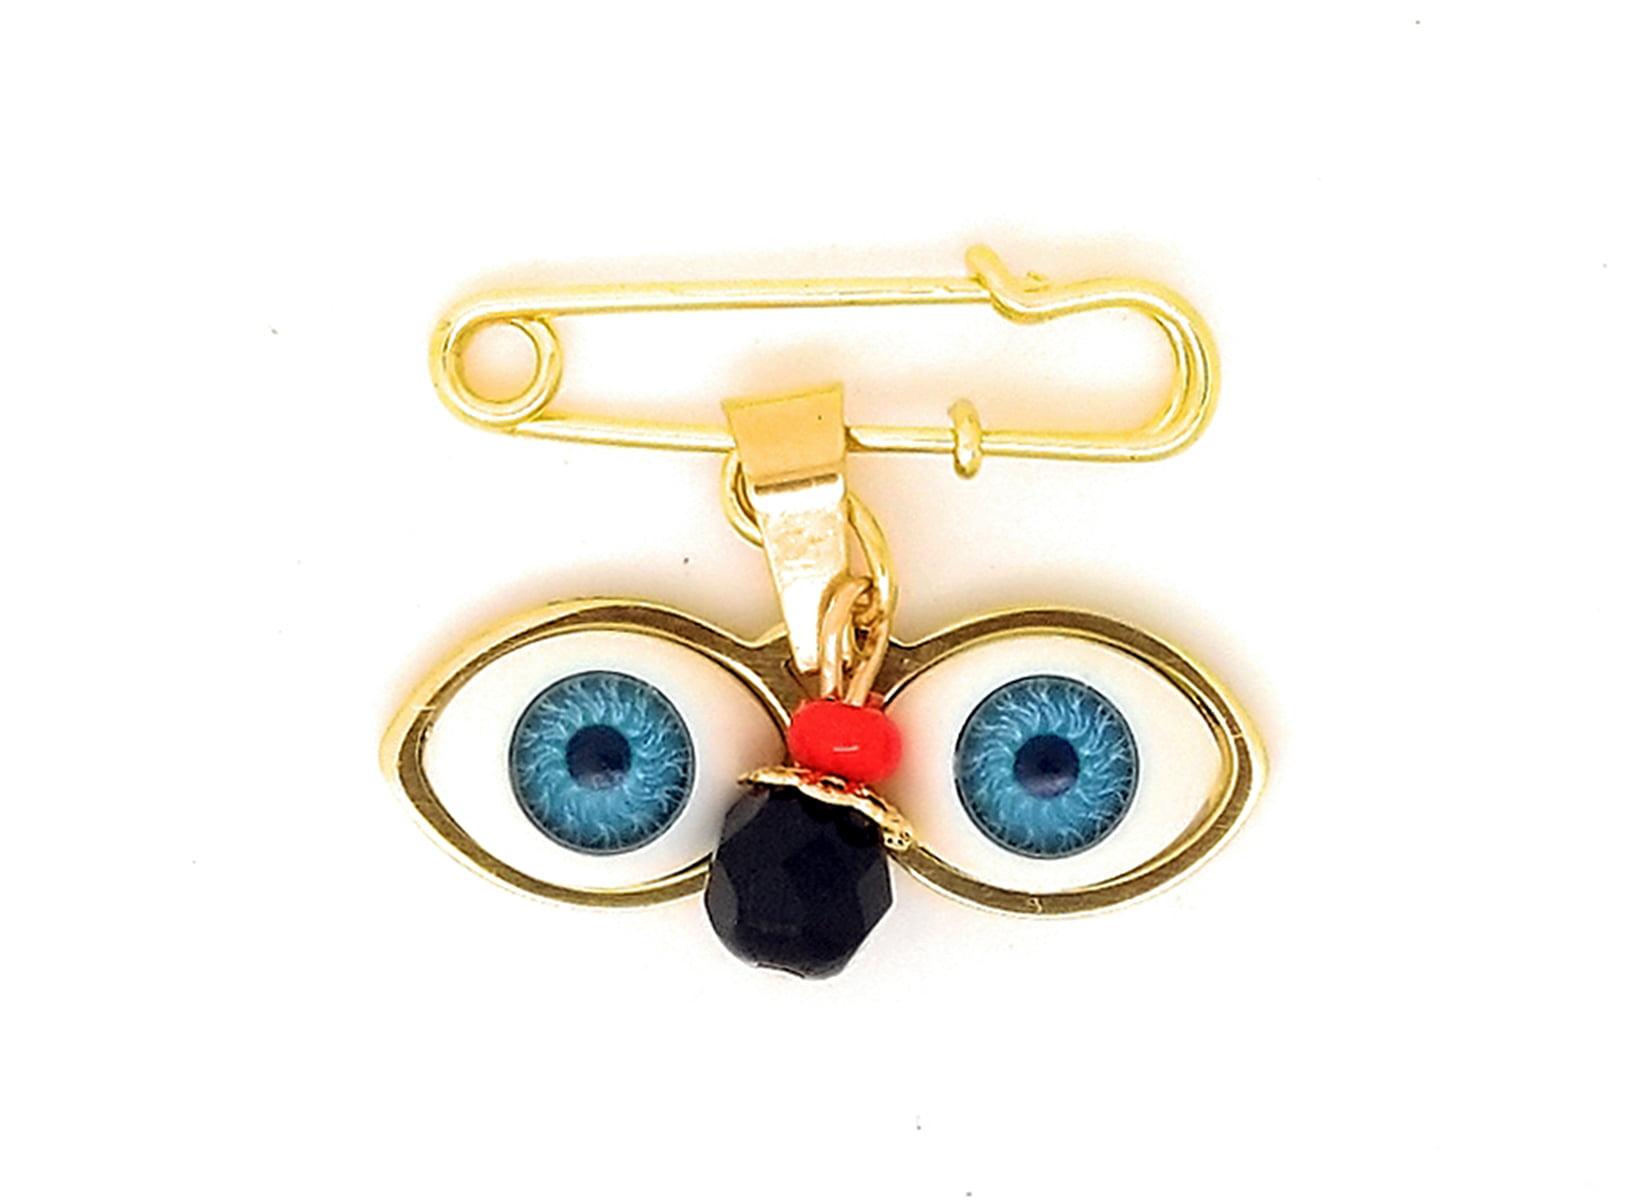 14kt Gold Plated Eyes Saint Lucky Charm Azabache Protection Baby Pin Brooch Ojitos De Santa Lucia Azabache Para... by